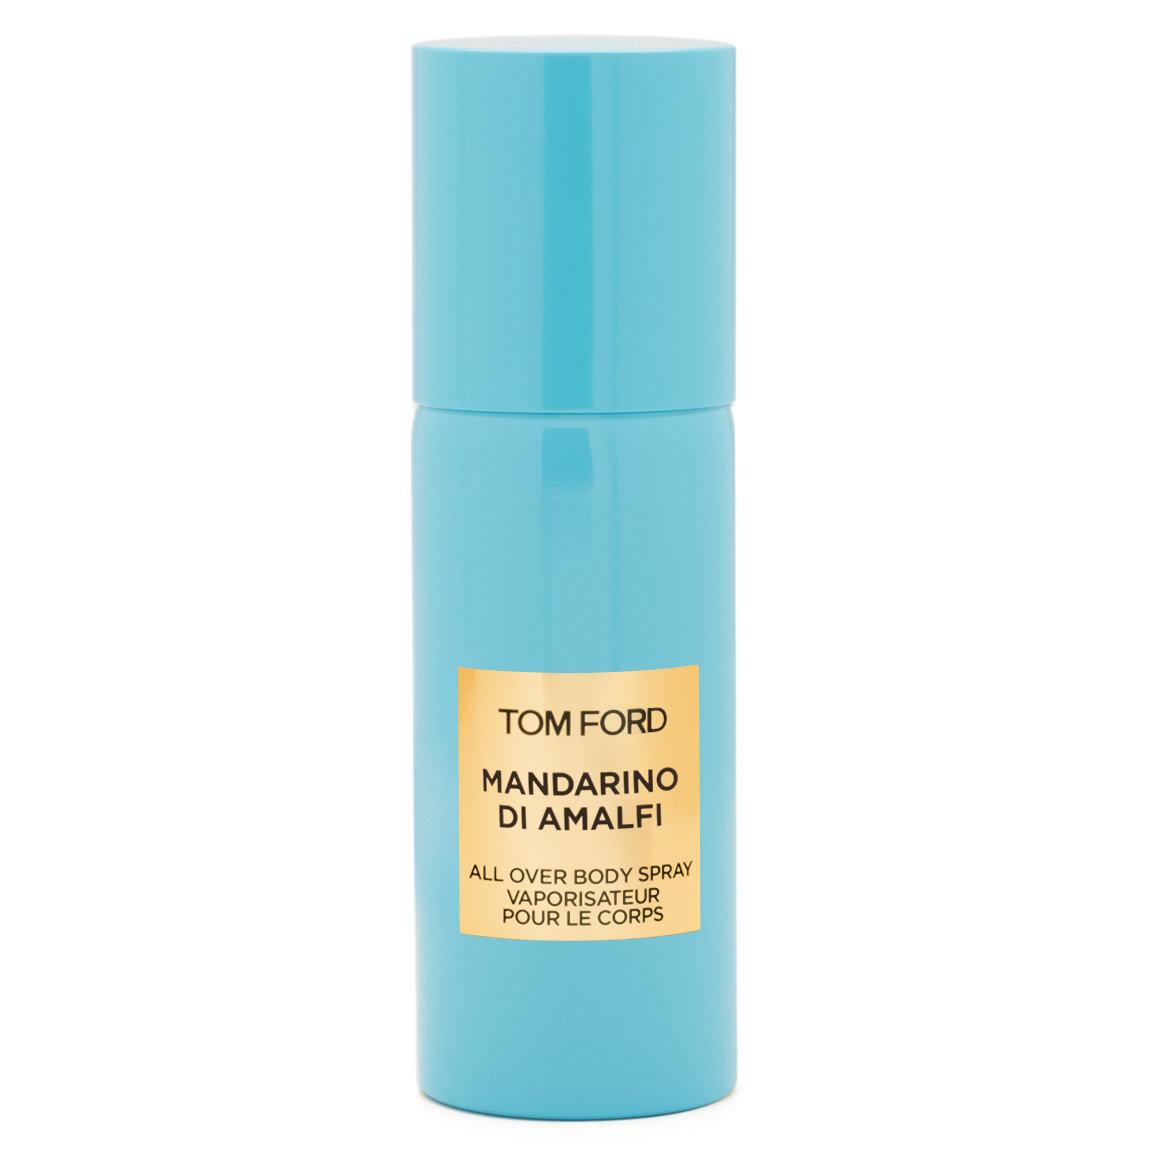 TOM FORD Mandarino di Amalfi All Over Body Spray product swatch.